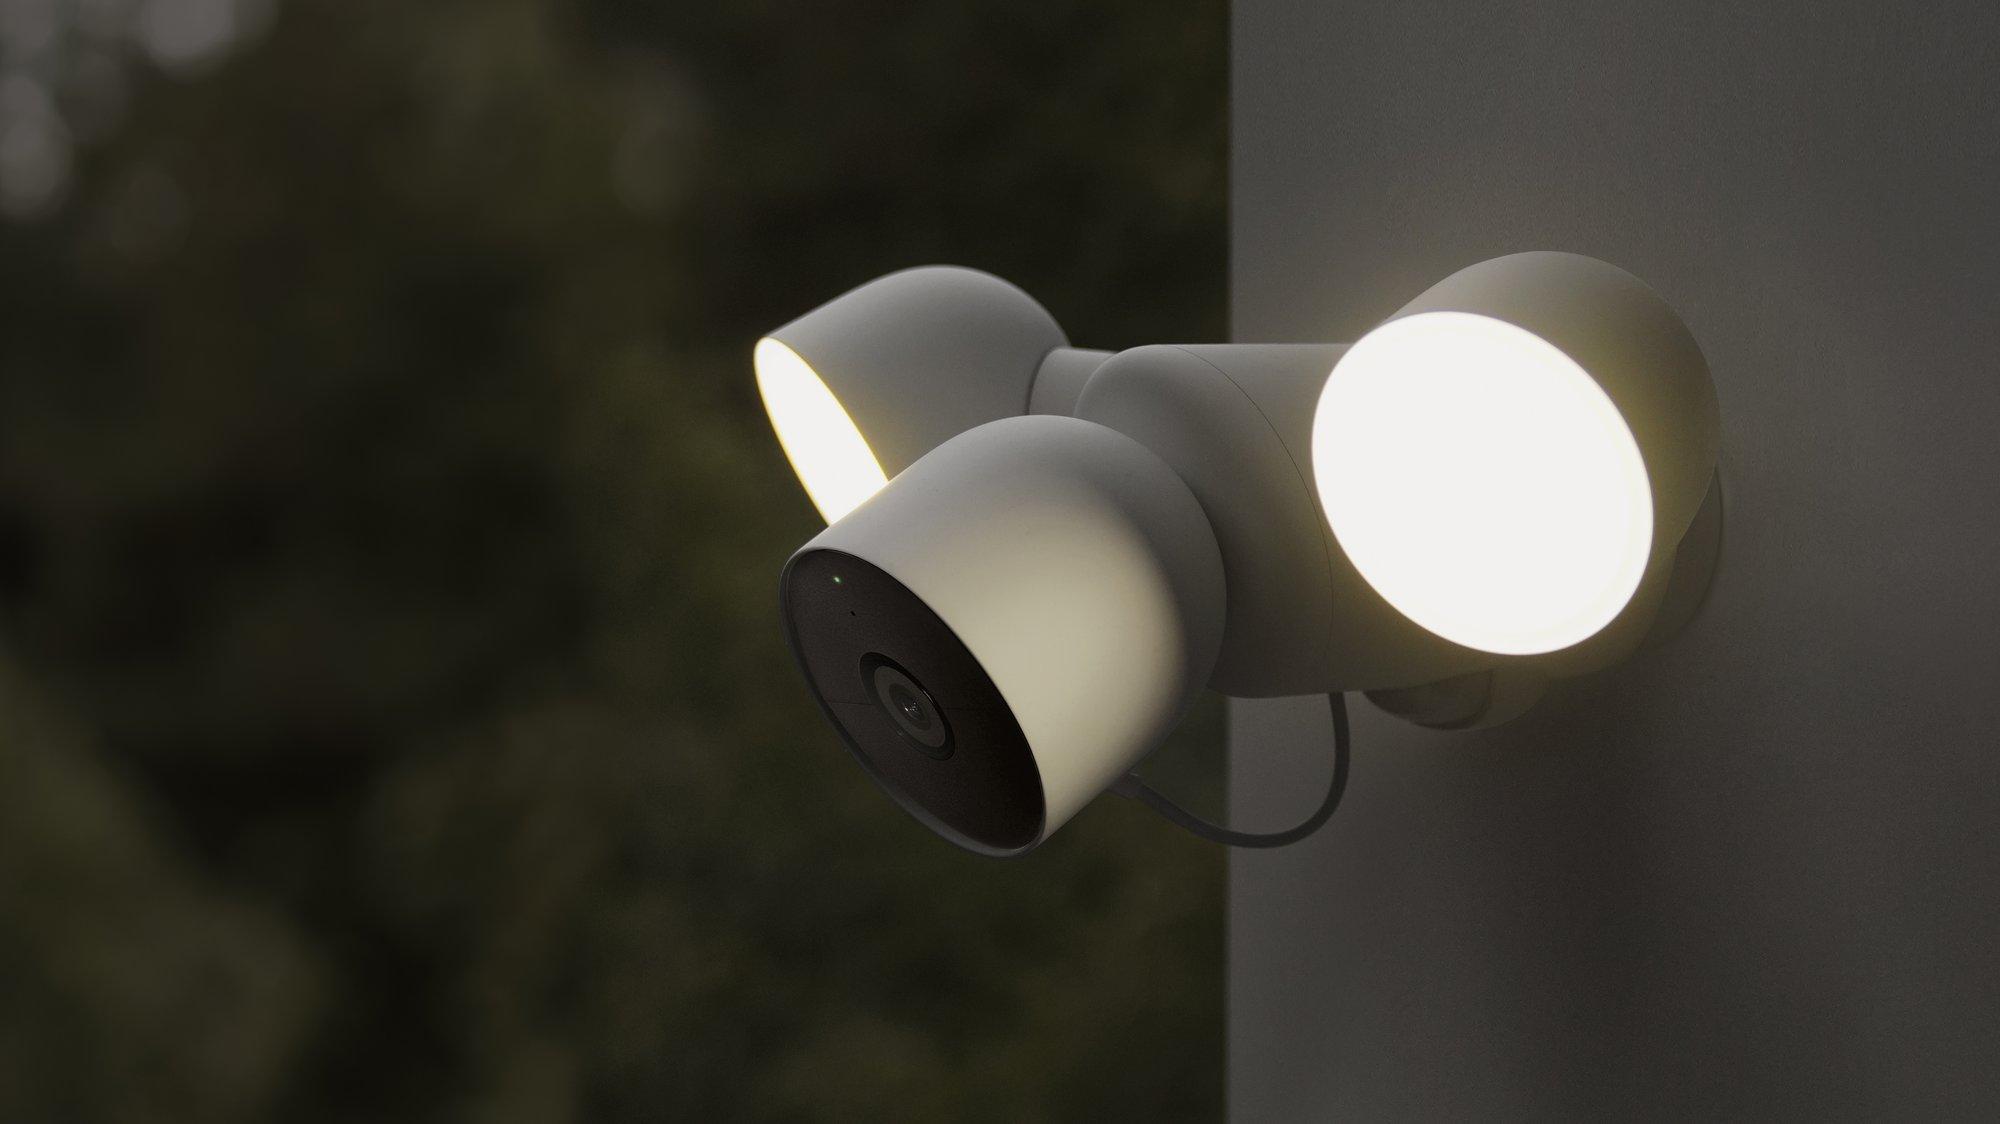 Nest Cam 2Nest Cam 2021 met Floodlight.021 met Floodlight.